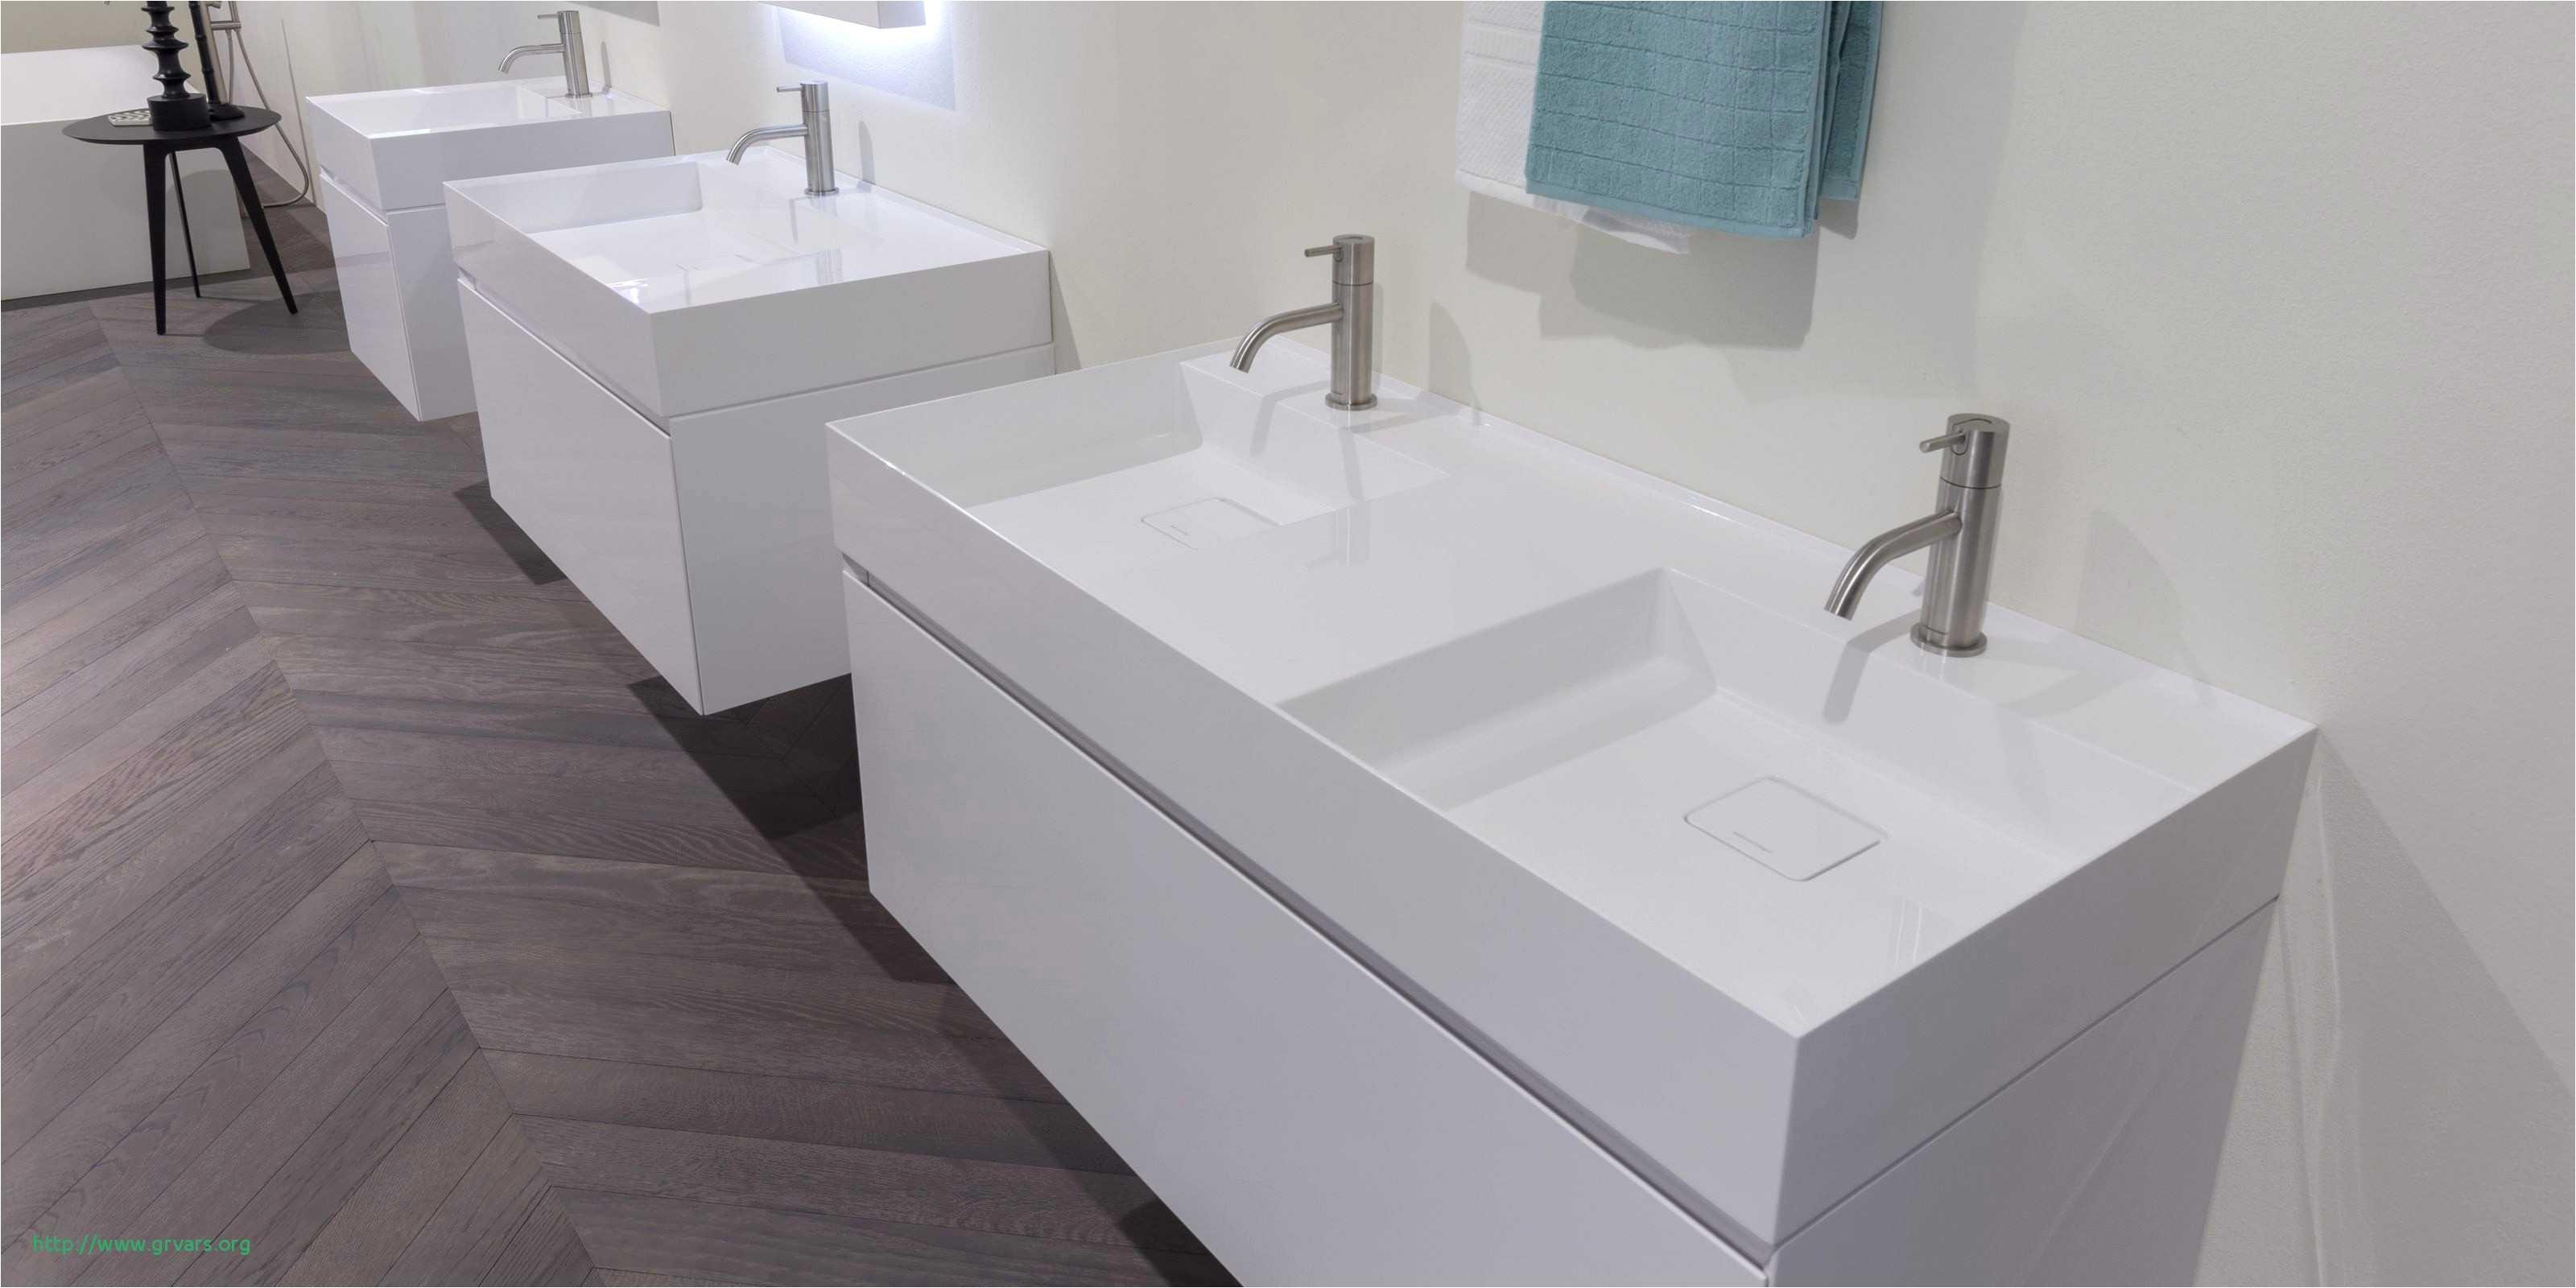 adorable bathroom floor tile designs on kitchen and bath tile luxury new tile floor mosaic bathroom 0d new